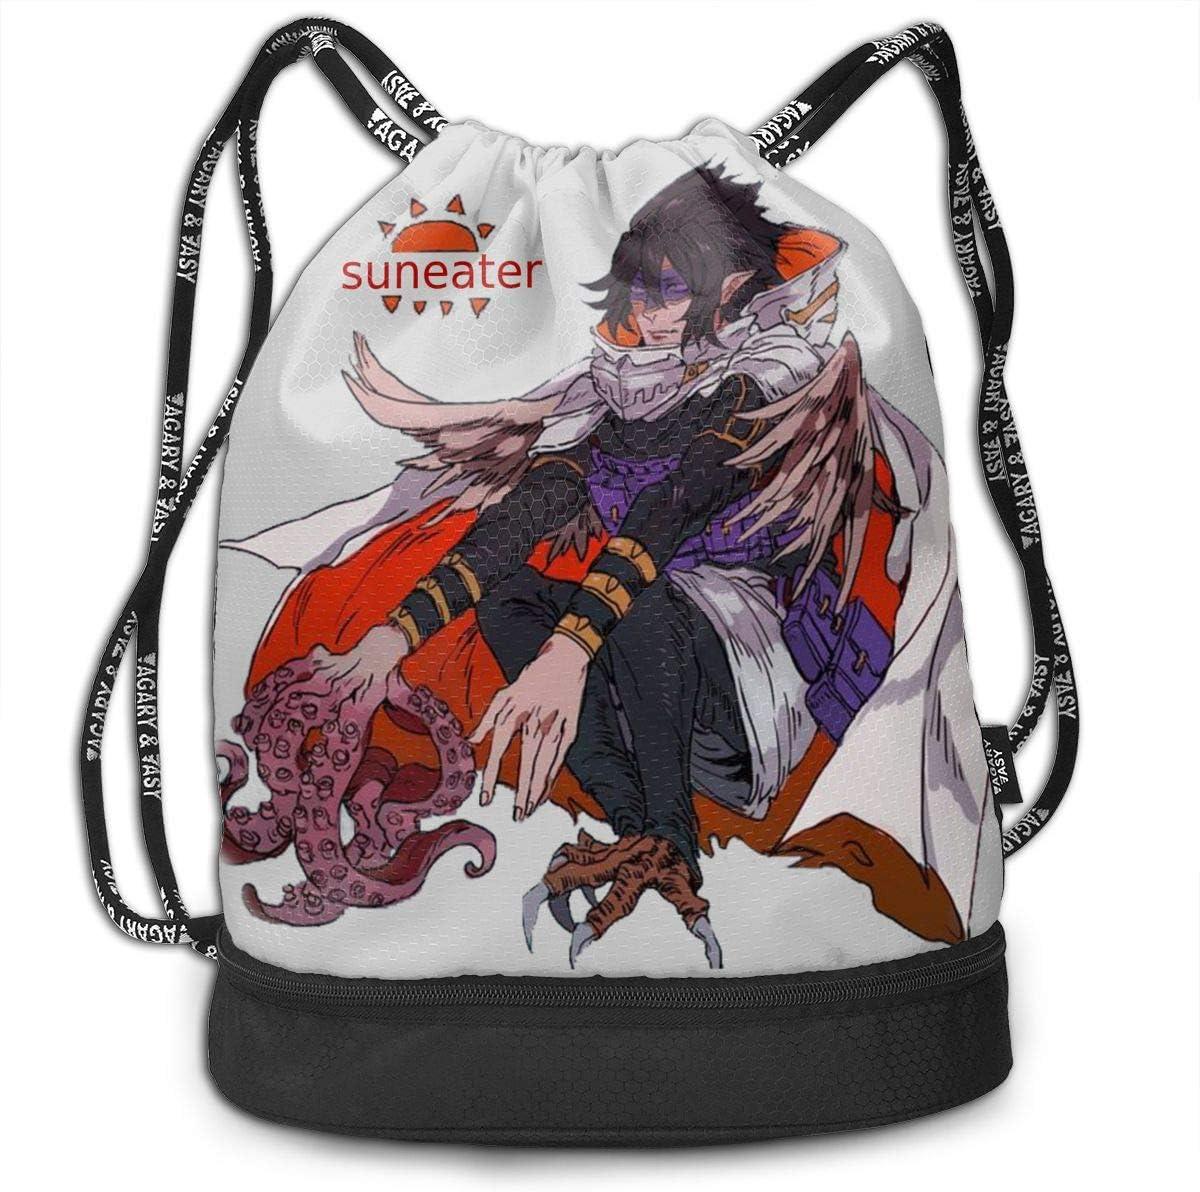 TVXQXIAH Suneater Tamaki Amajiki BNHA Backpack Large Capacity Bag for Youth 3D Backpack